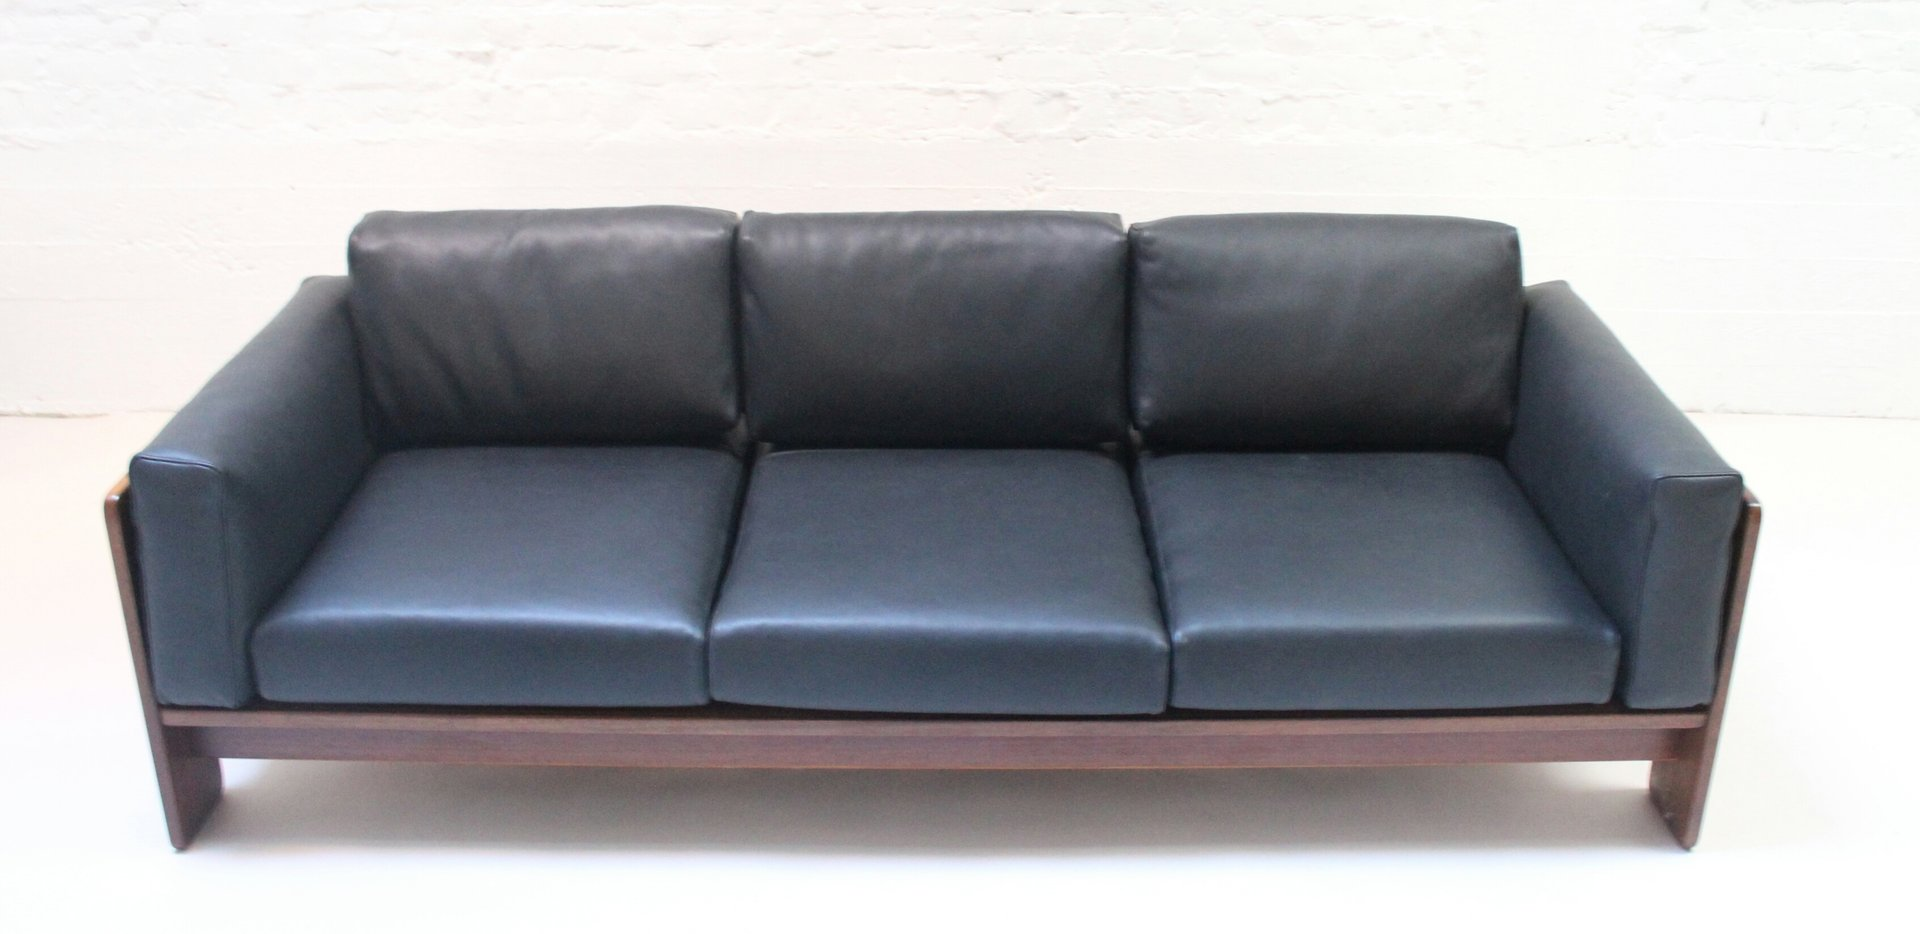 Bastiano Drei- Sitzer Sofa von Afra & Tobia Scarpa für Gavina, 1960er